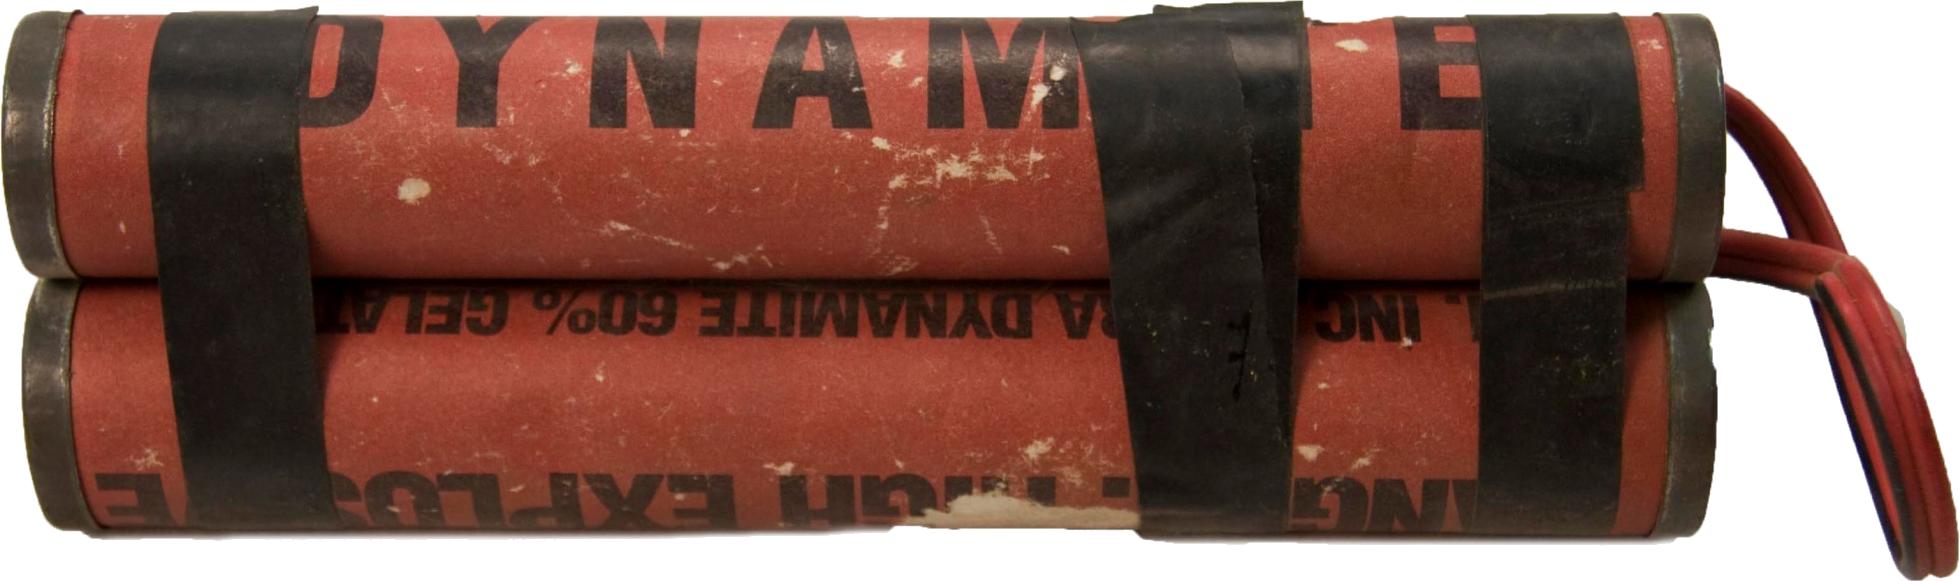 Бомба с таймером PNG